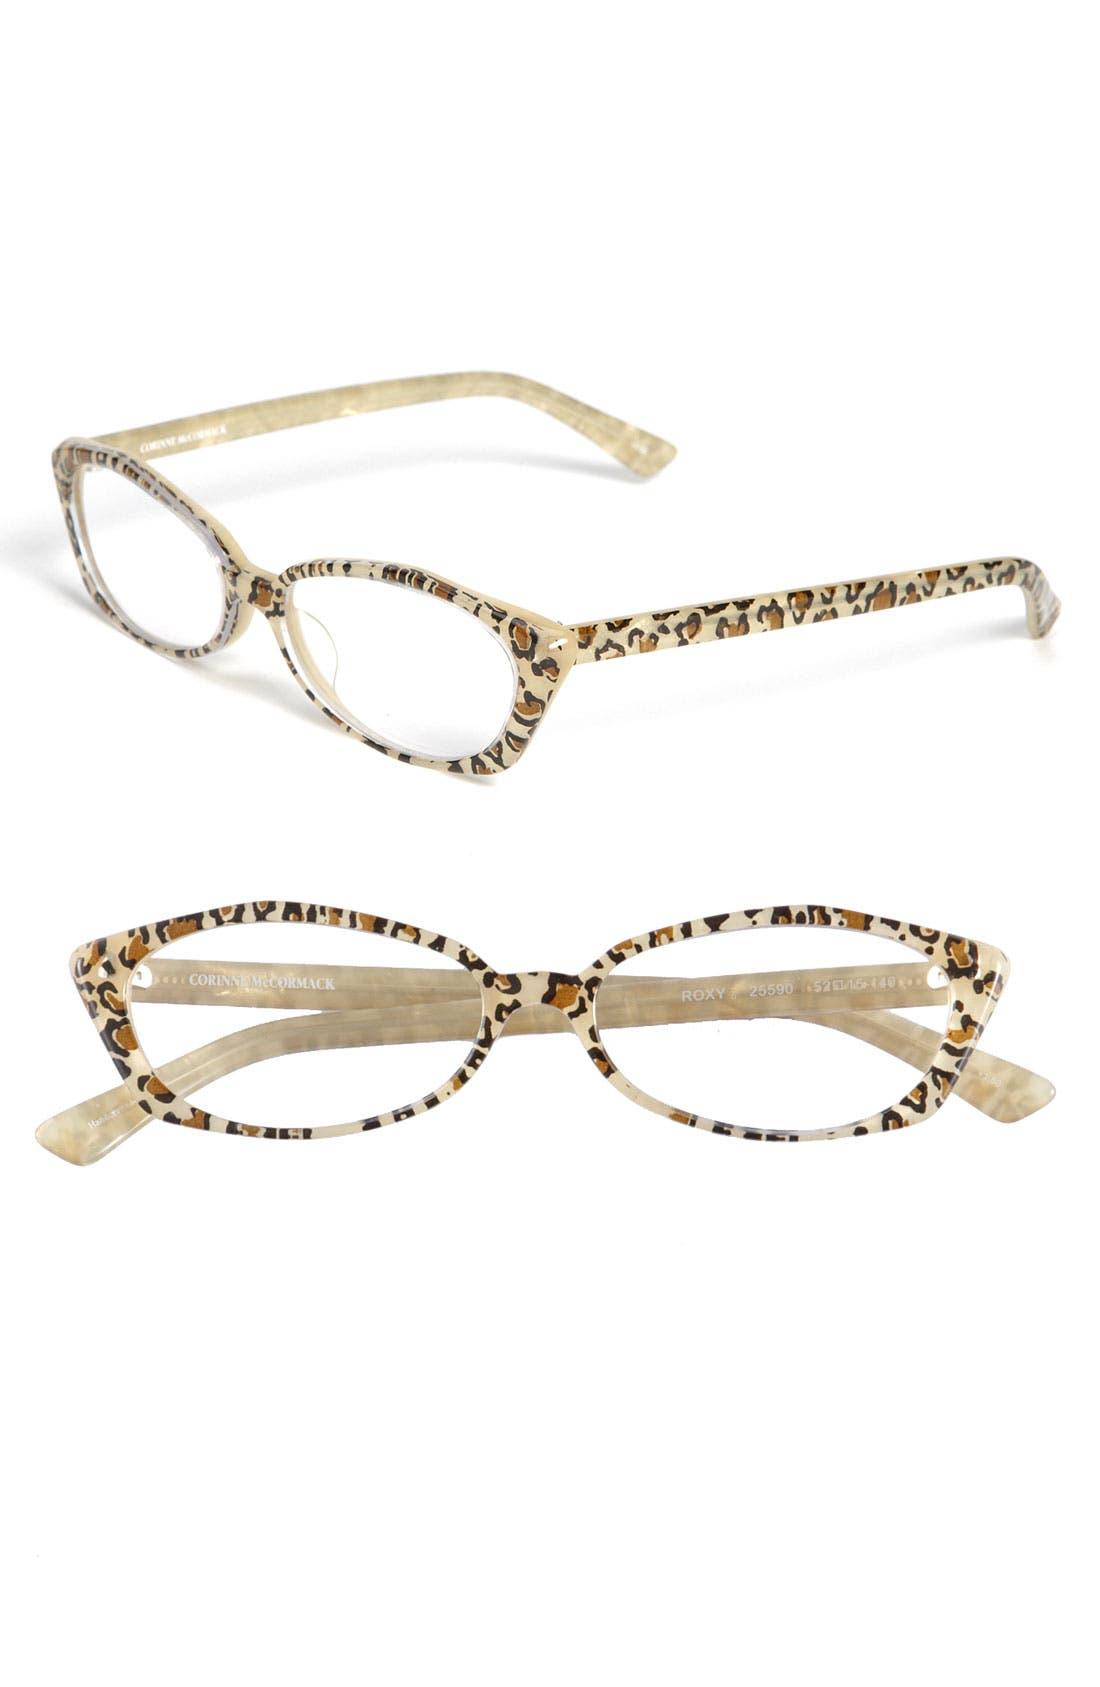 Main Image - Corinne McCormack Cat's Eye Reading Glasses